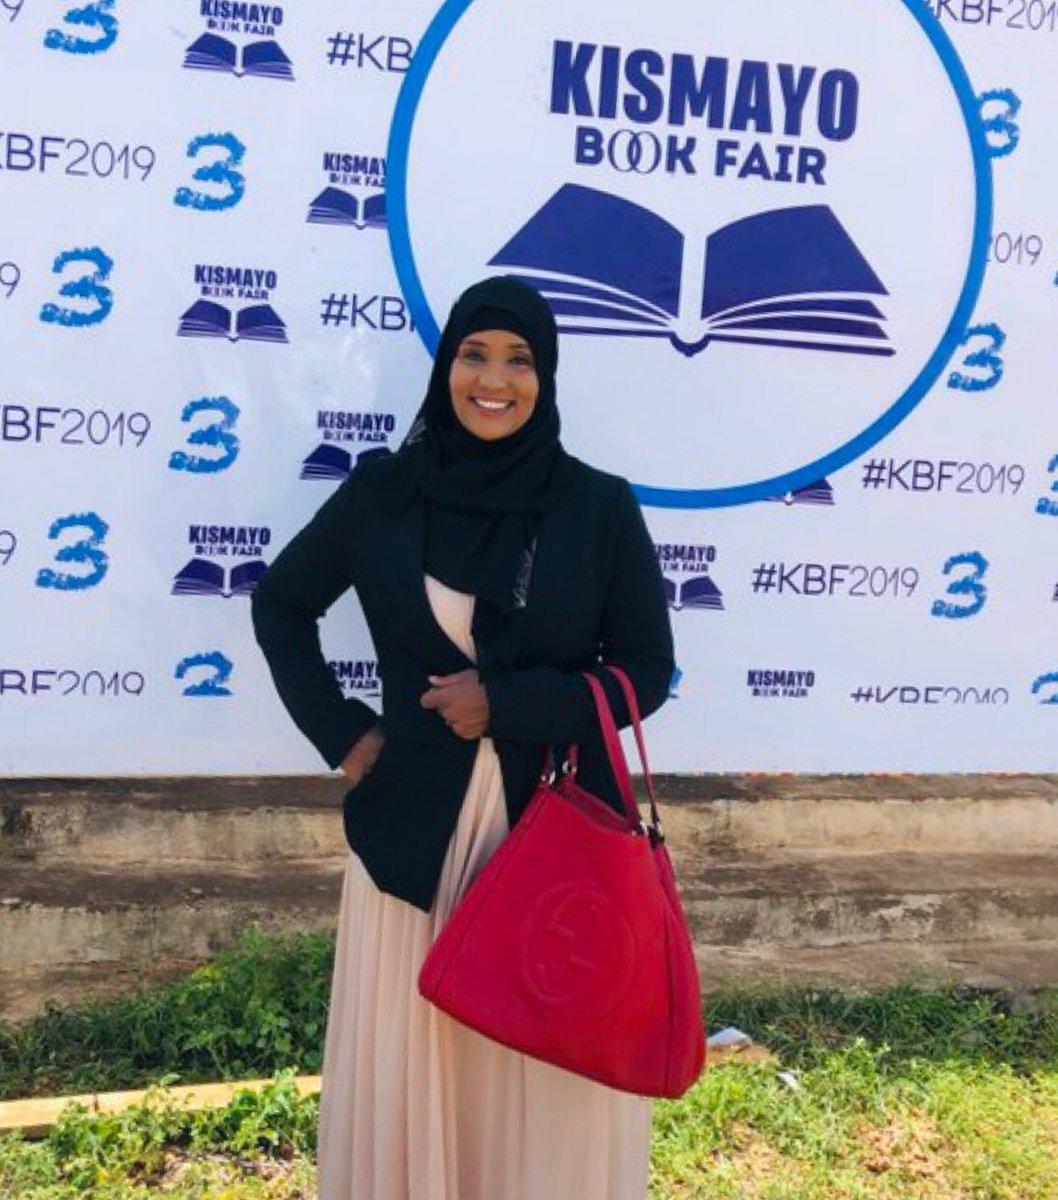 'Brave, inspiring' Somali-Canadian journalist killed in Kismayo